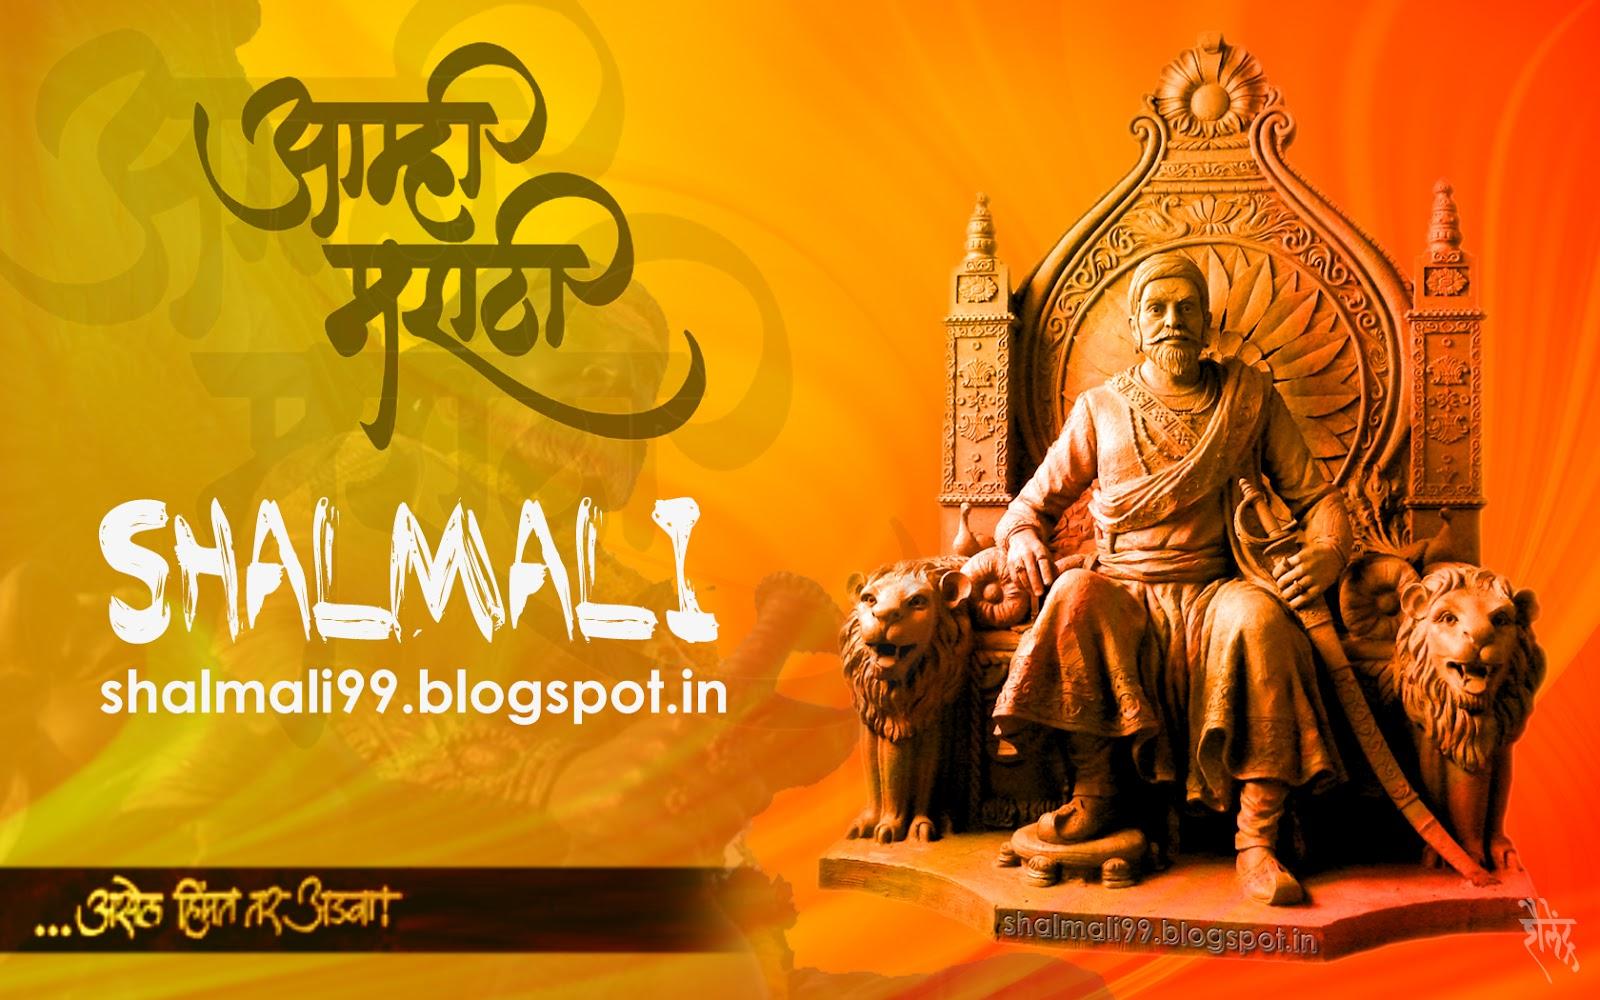 http://4.bp.blogspot.com/-RI1ZytgdVBI/UEzqx15bSJI/AAAAAAAAAeQ/zmnThGVPozY/s1600/Shivaji+Maharaj_Marathi.jpg